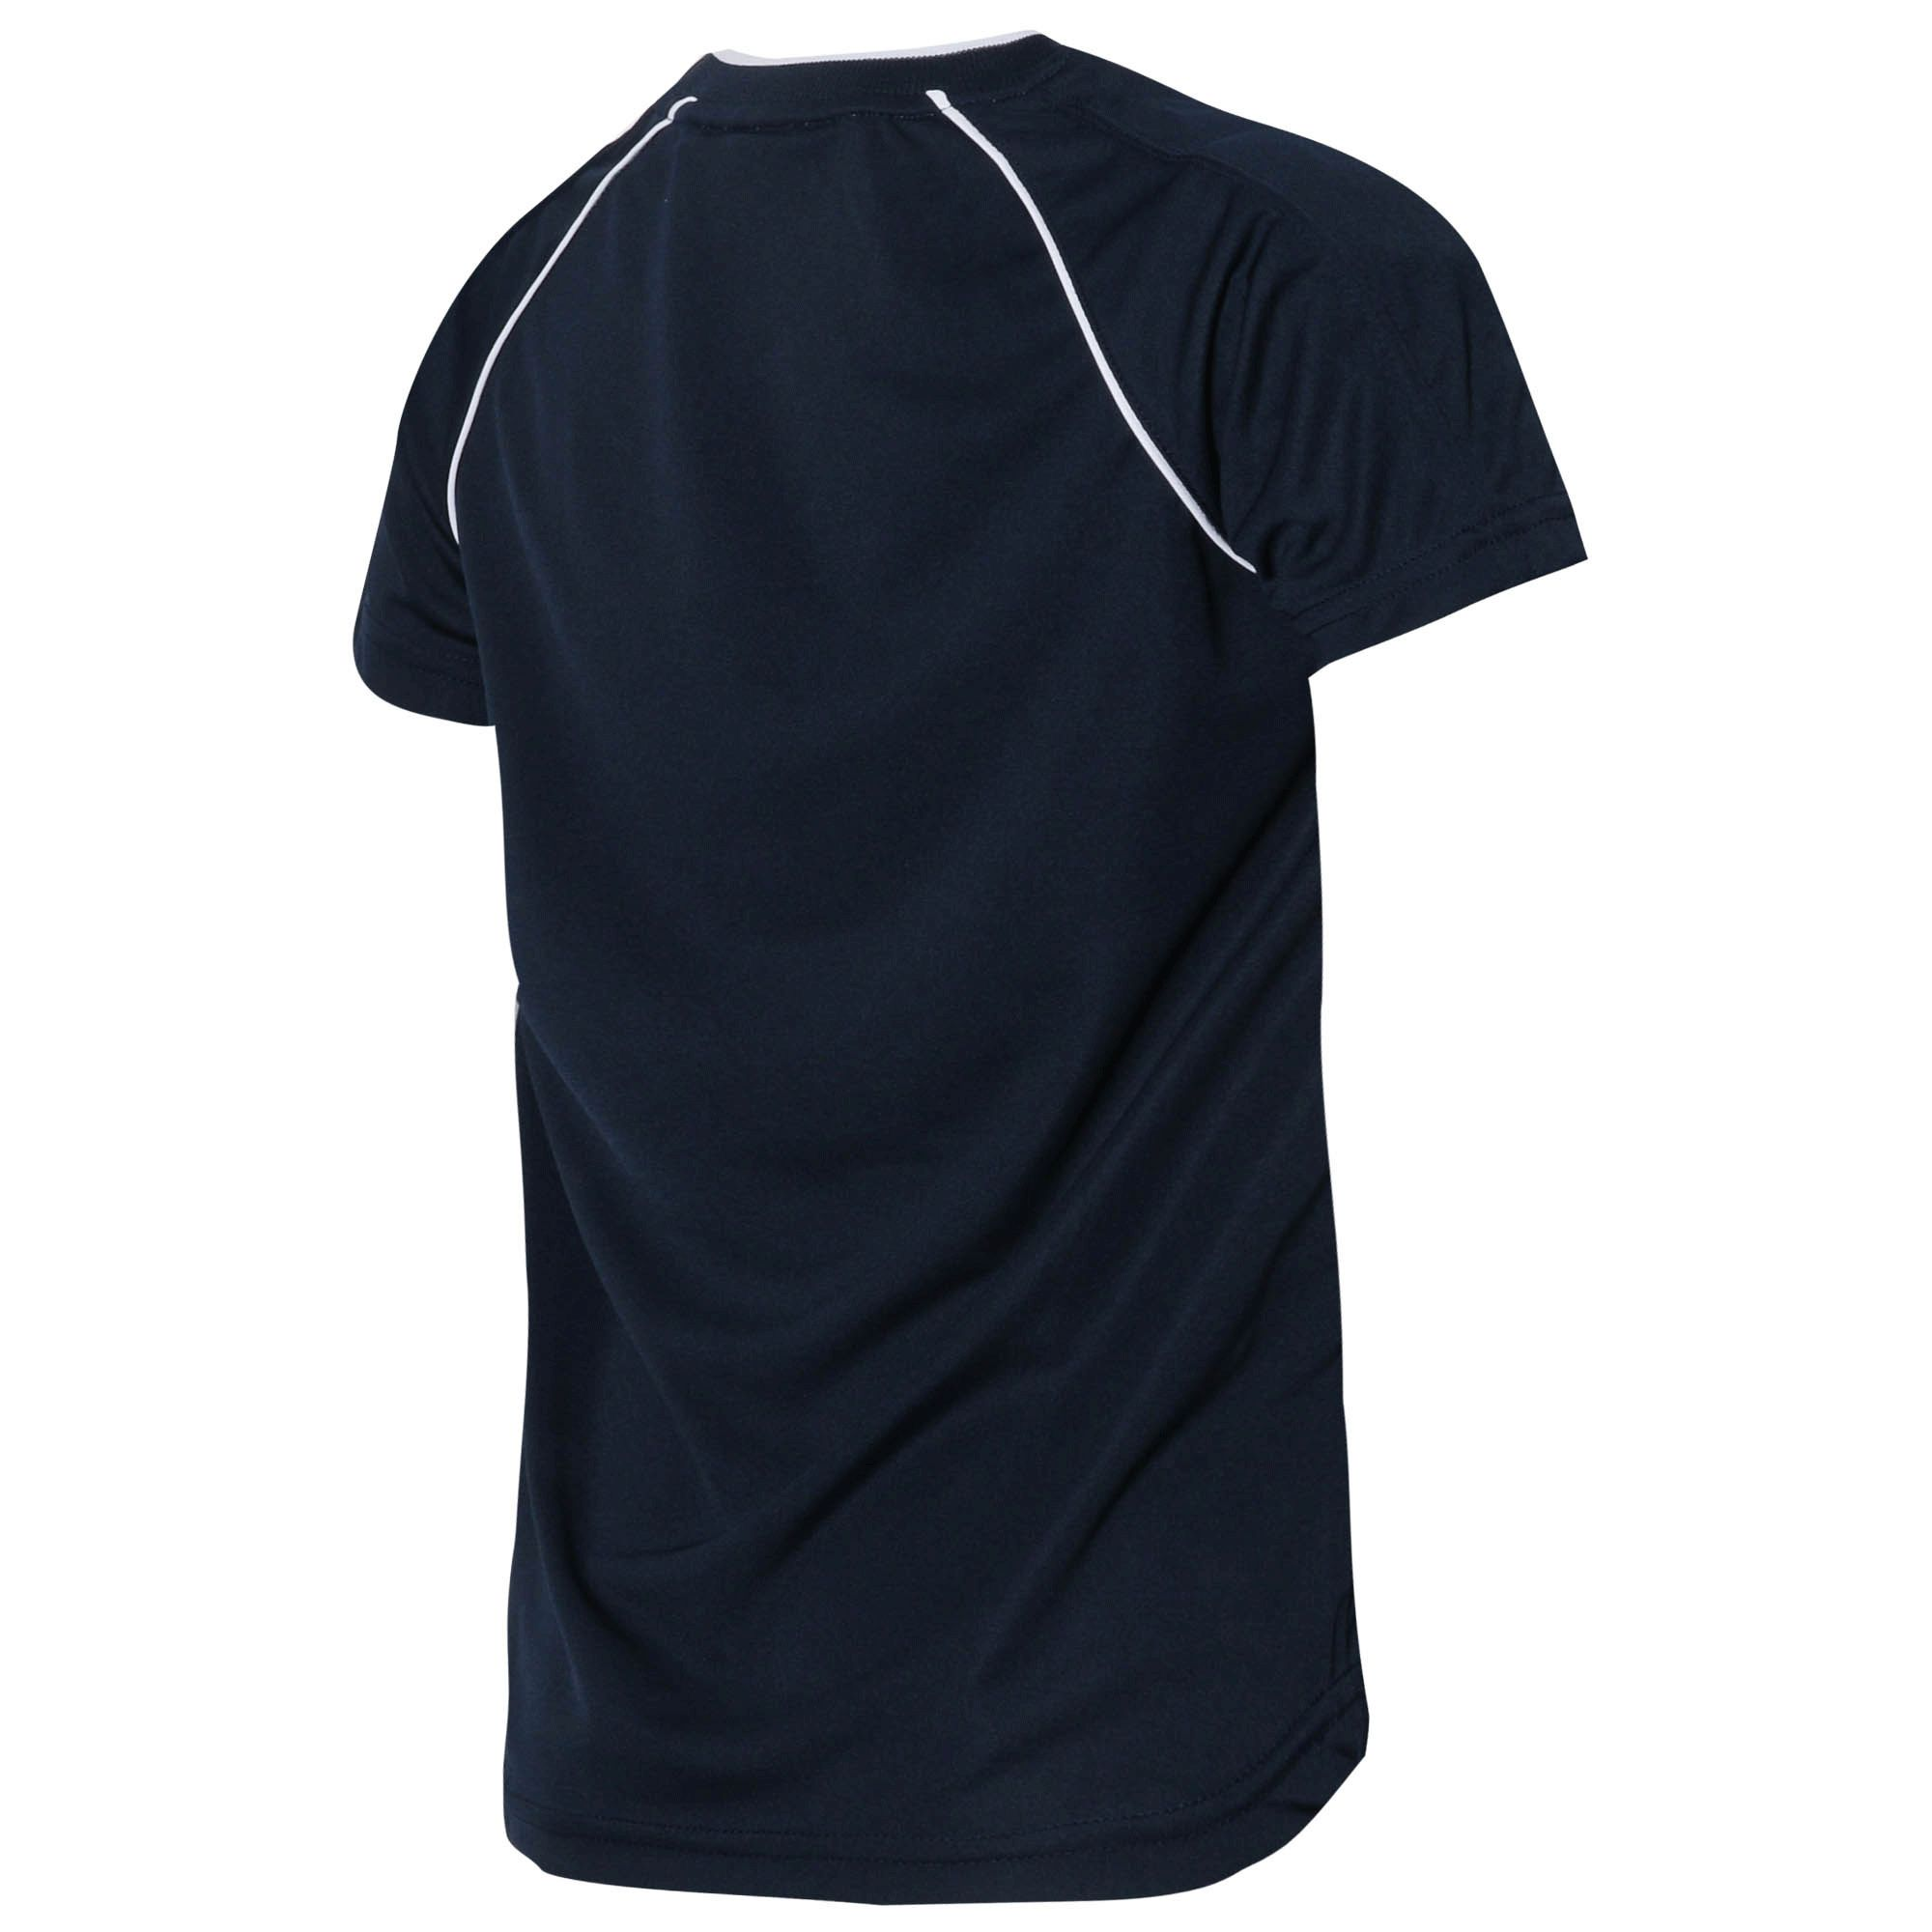 Official Team FC Barcelona Polyester T-Shirt